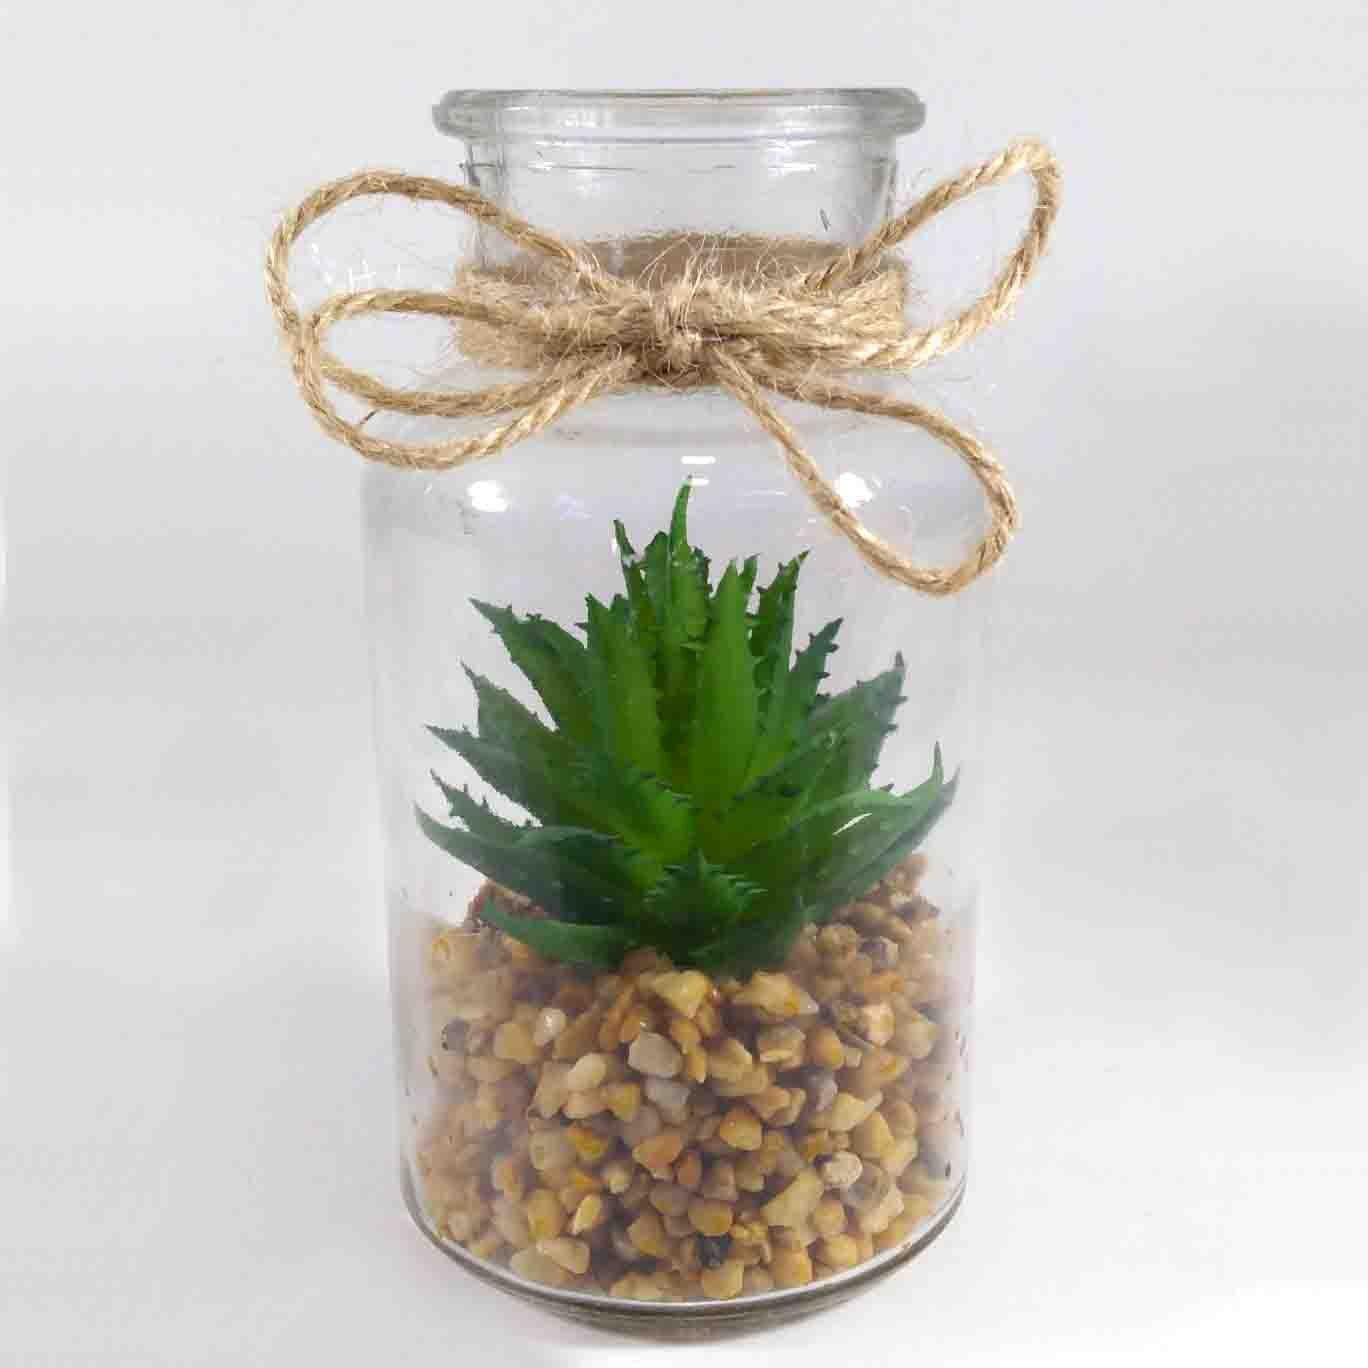 Flor Suculenta C/ Vaso Vidro P/ Pendurar Cor Verde Artificial Permanente 12CM 37200-01